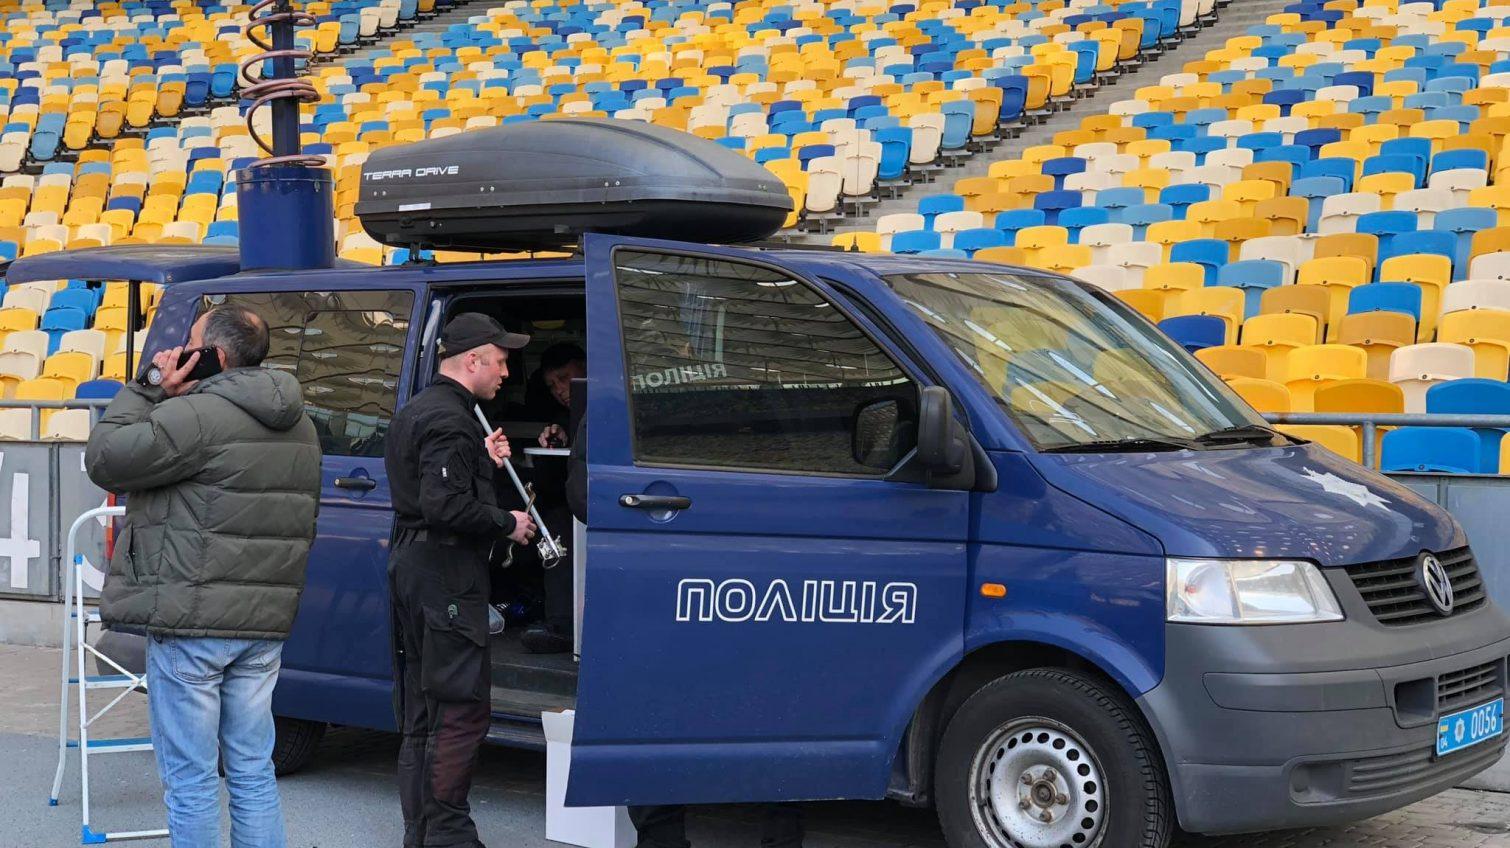 «Олимпийский» готовят к дебатам: полиция прибыла на место для обеспечения безопасности (фото) «фото»